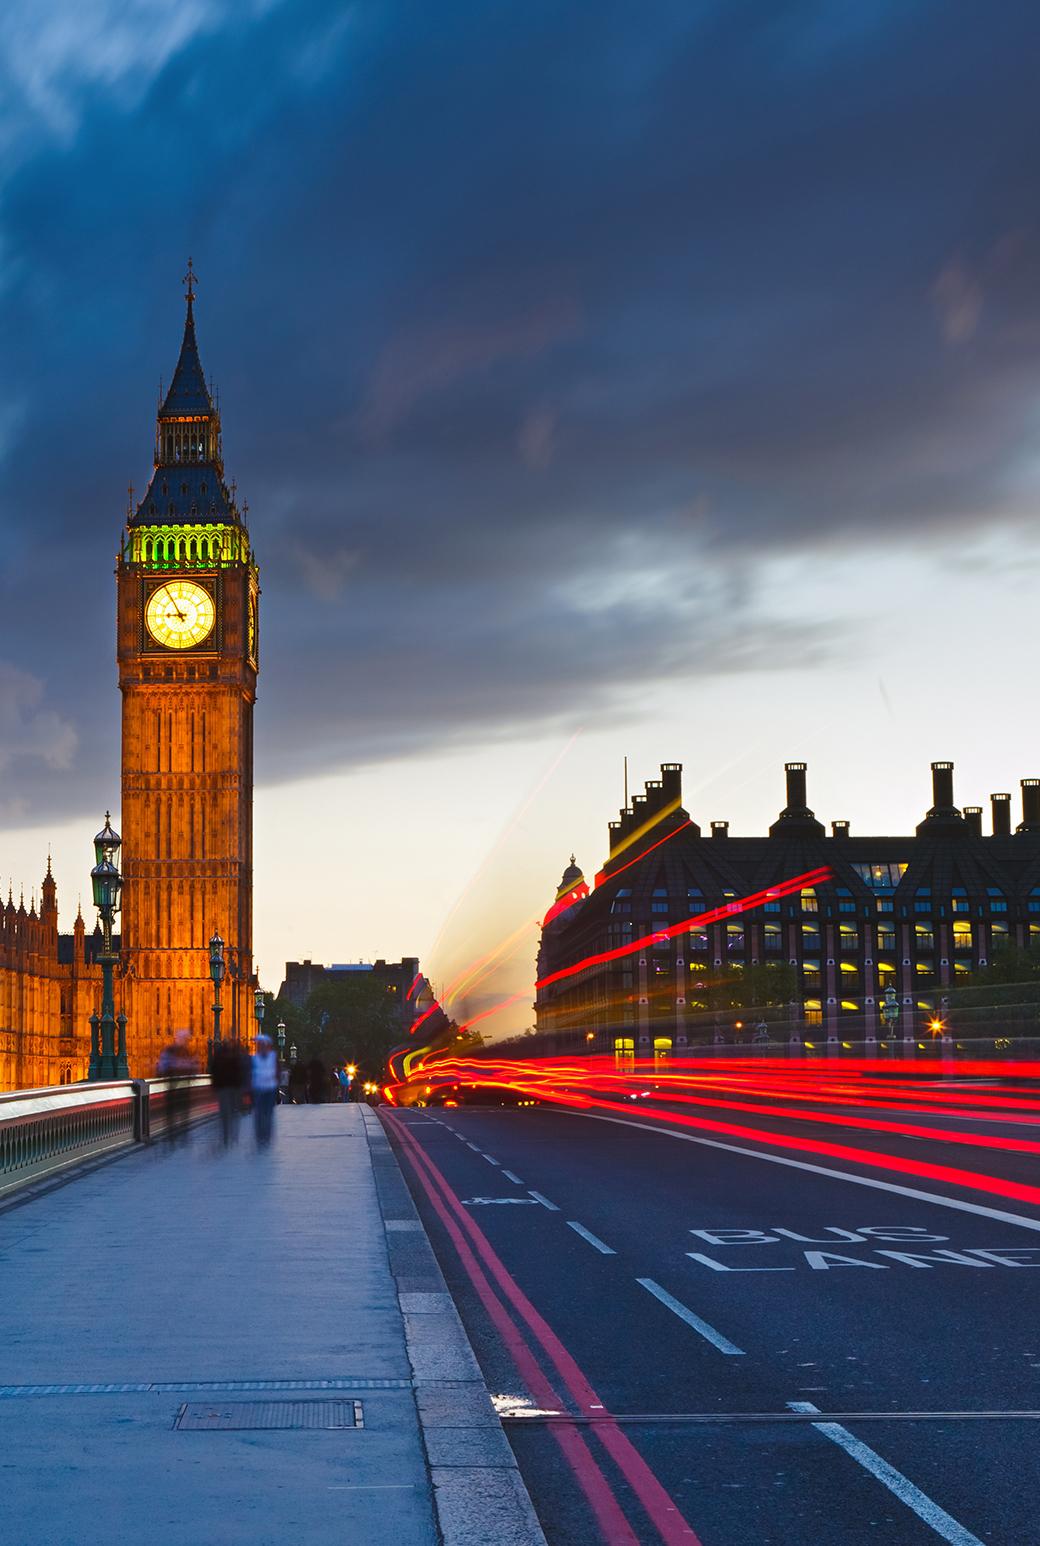 Big Ben London Wallpaper For Iphone X 8 7 6 Free